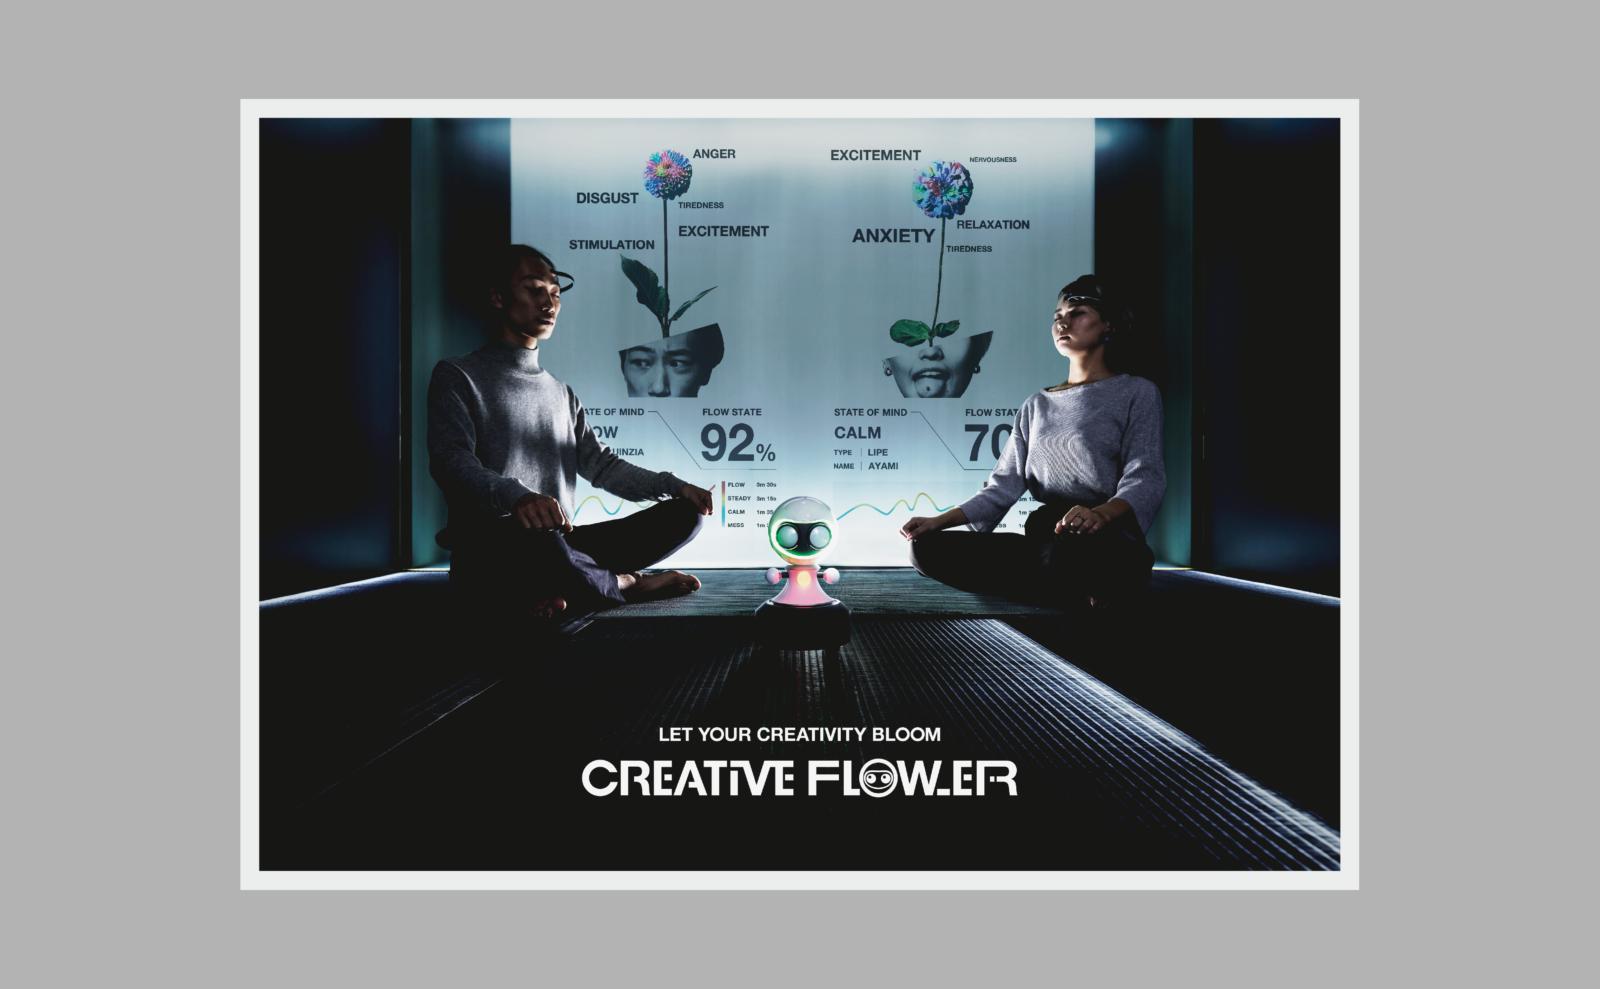 CREATIVE FLOW_ER__-4